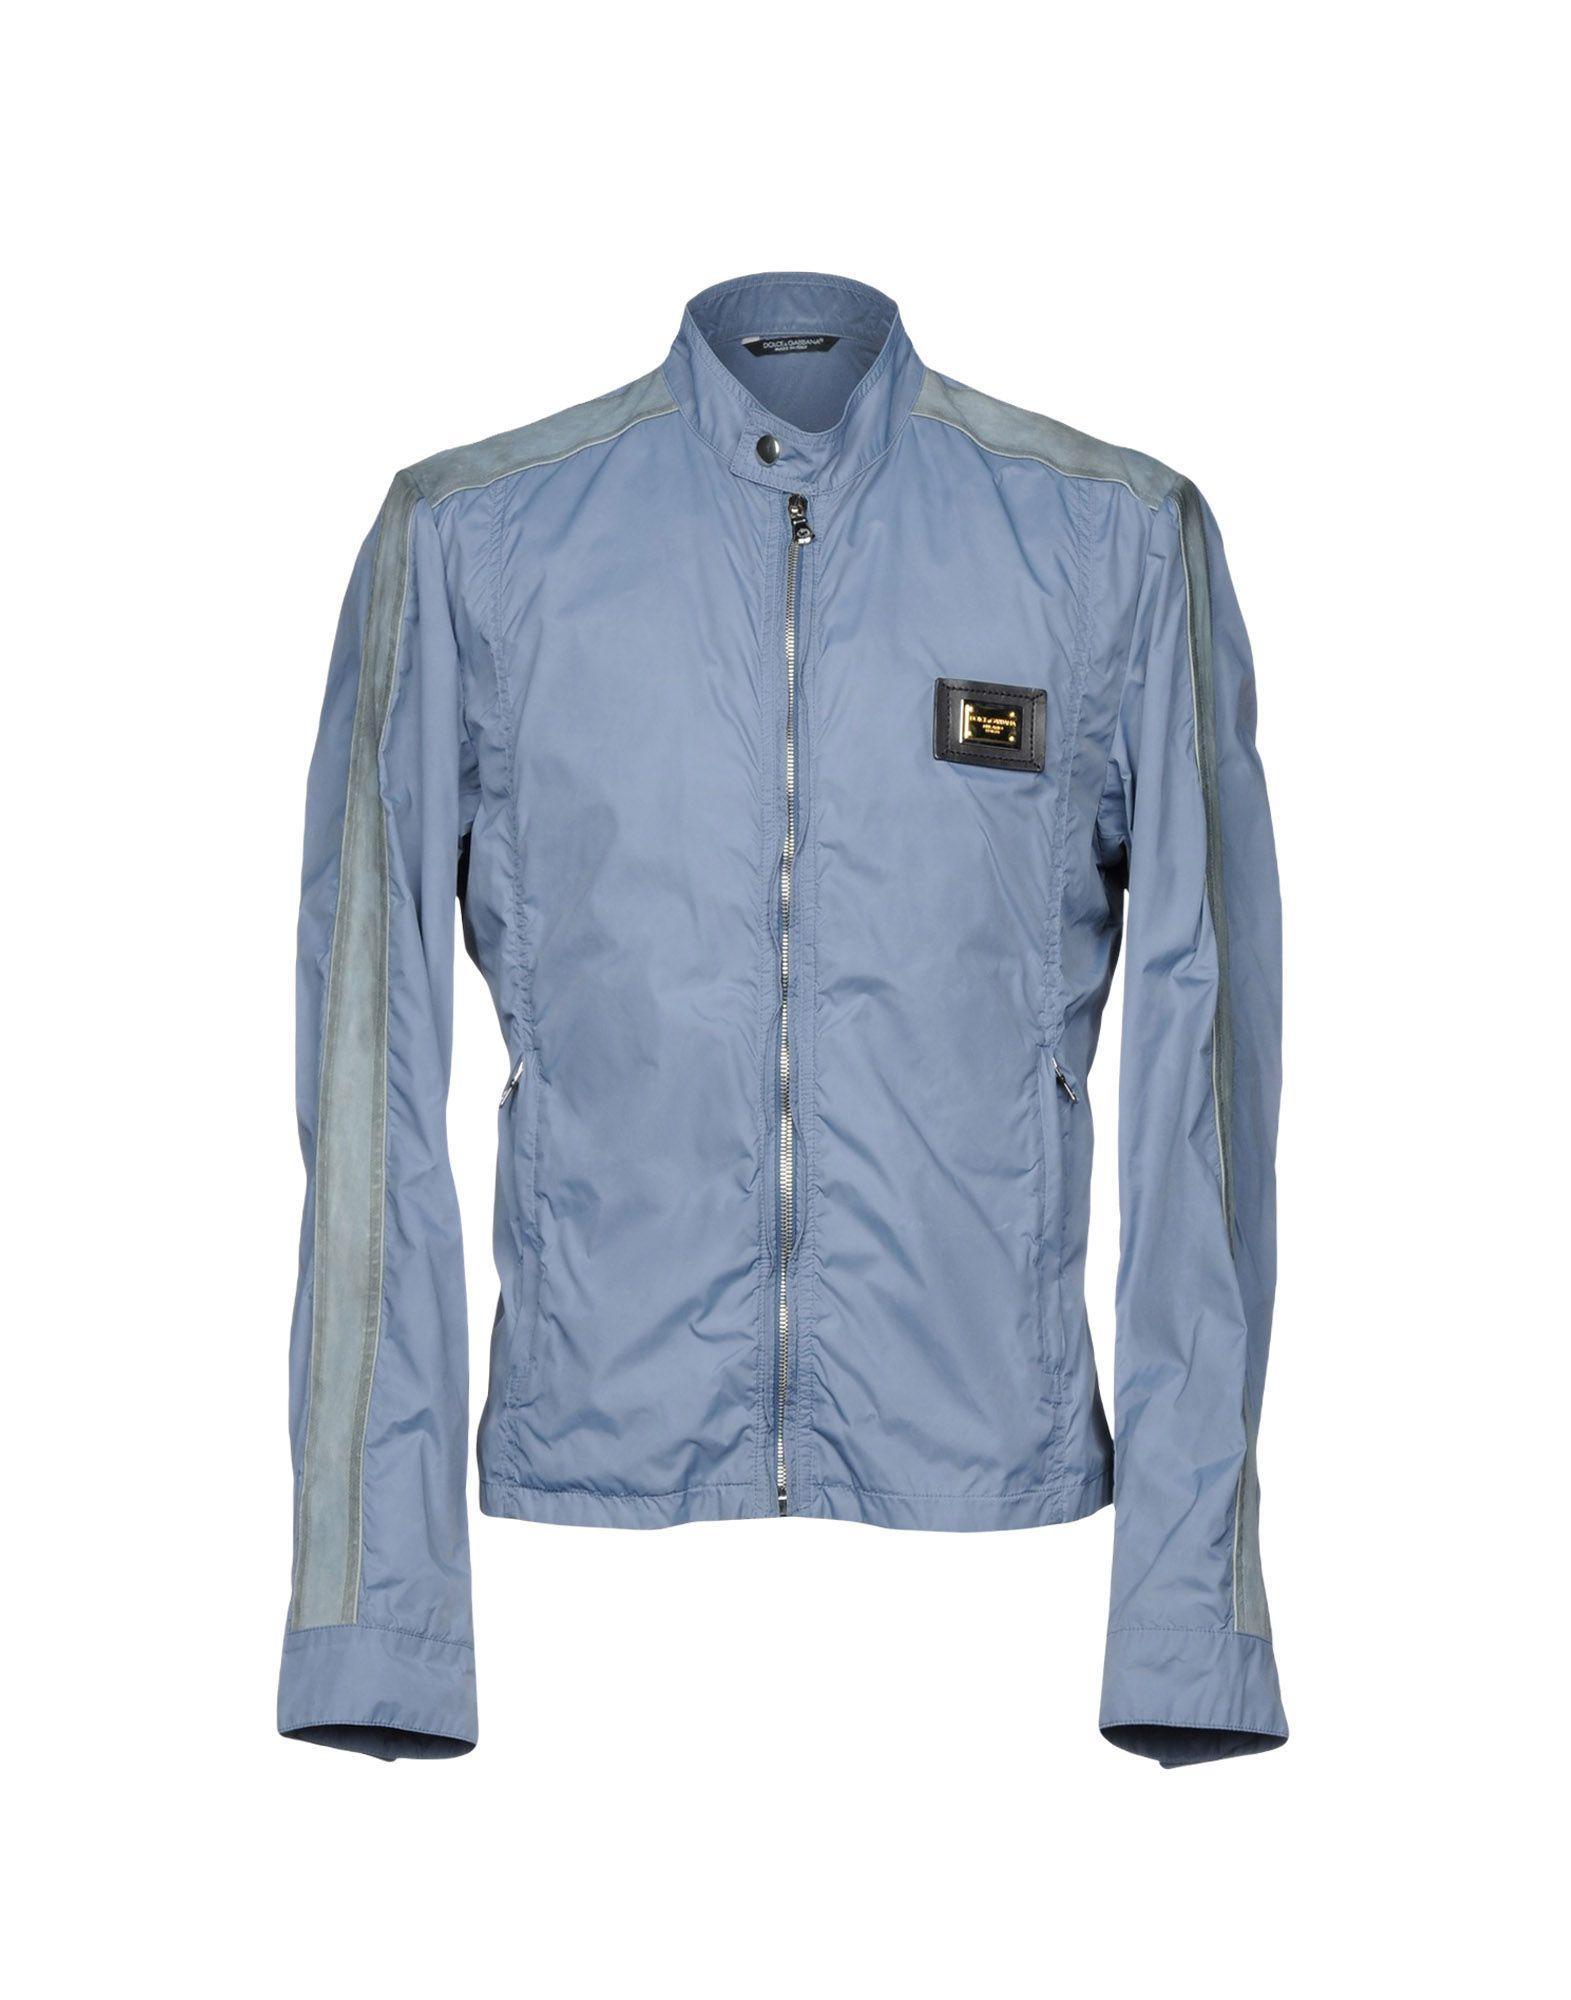 Dolce & Gabbana Jackets In Pastel Blue